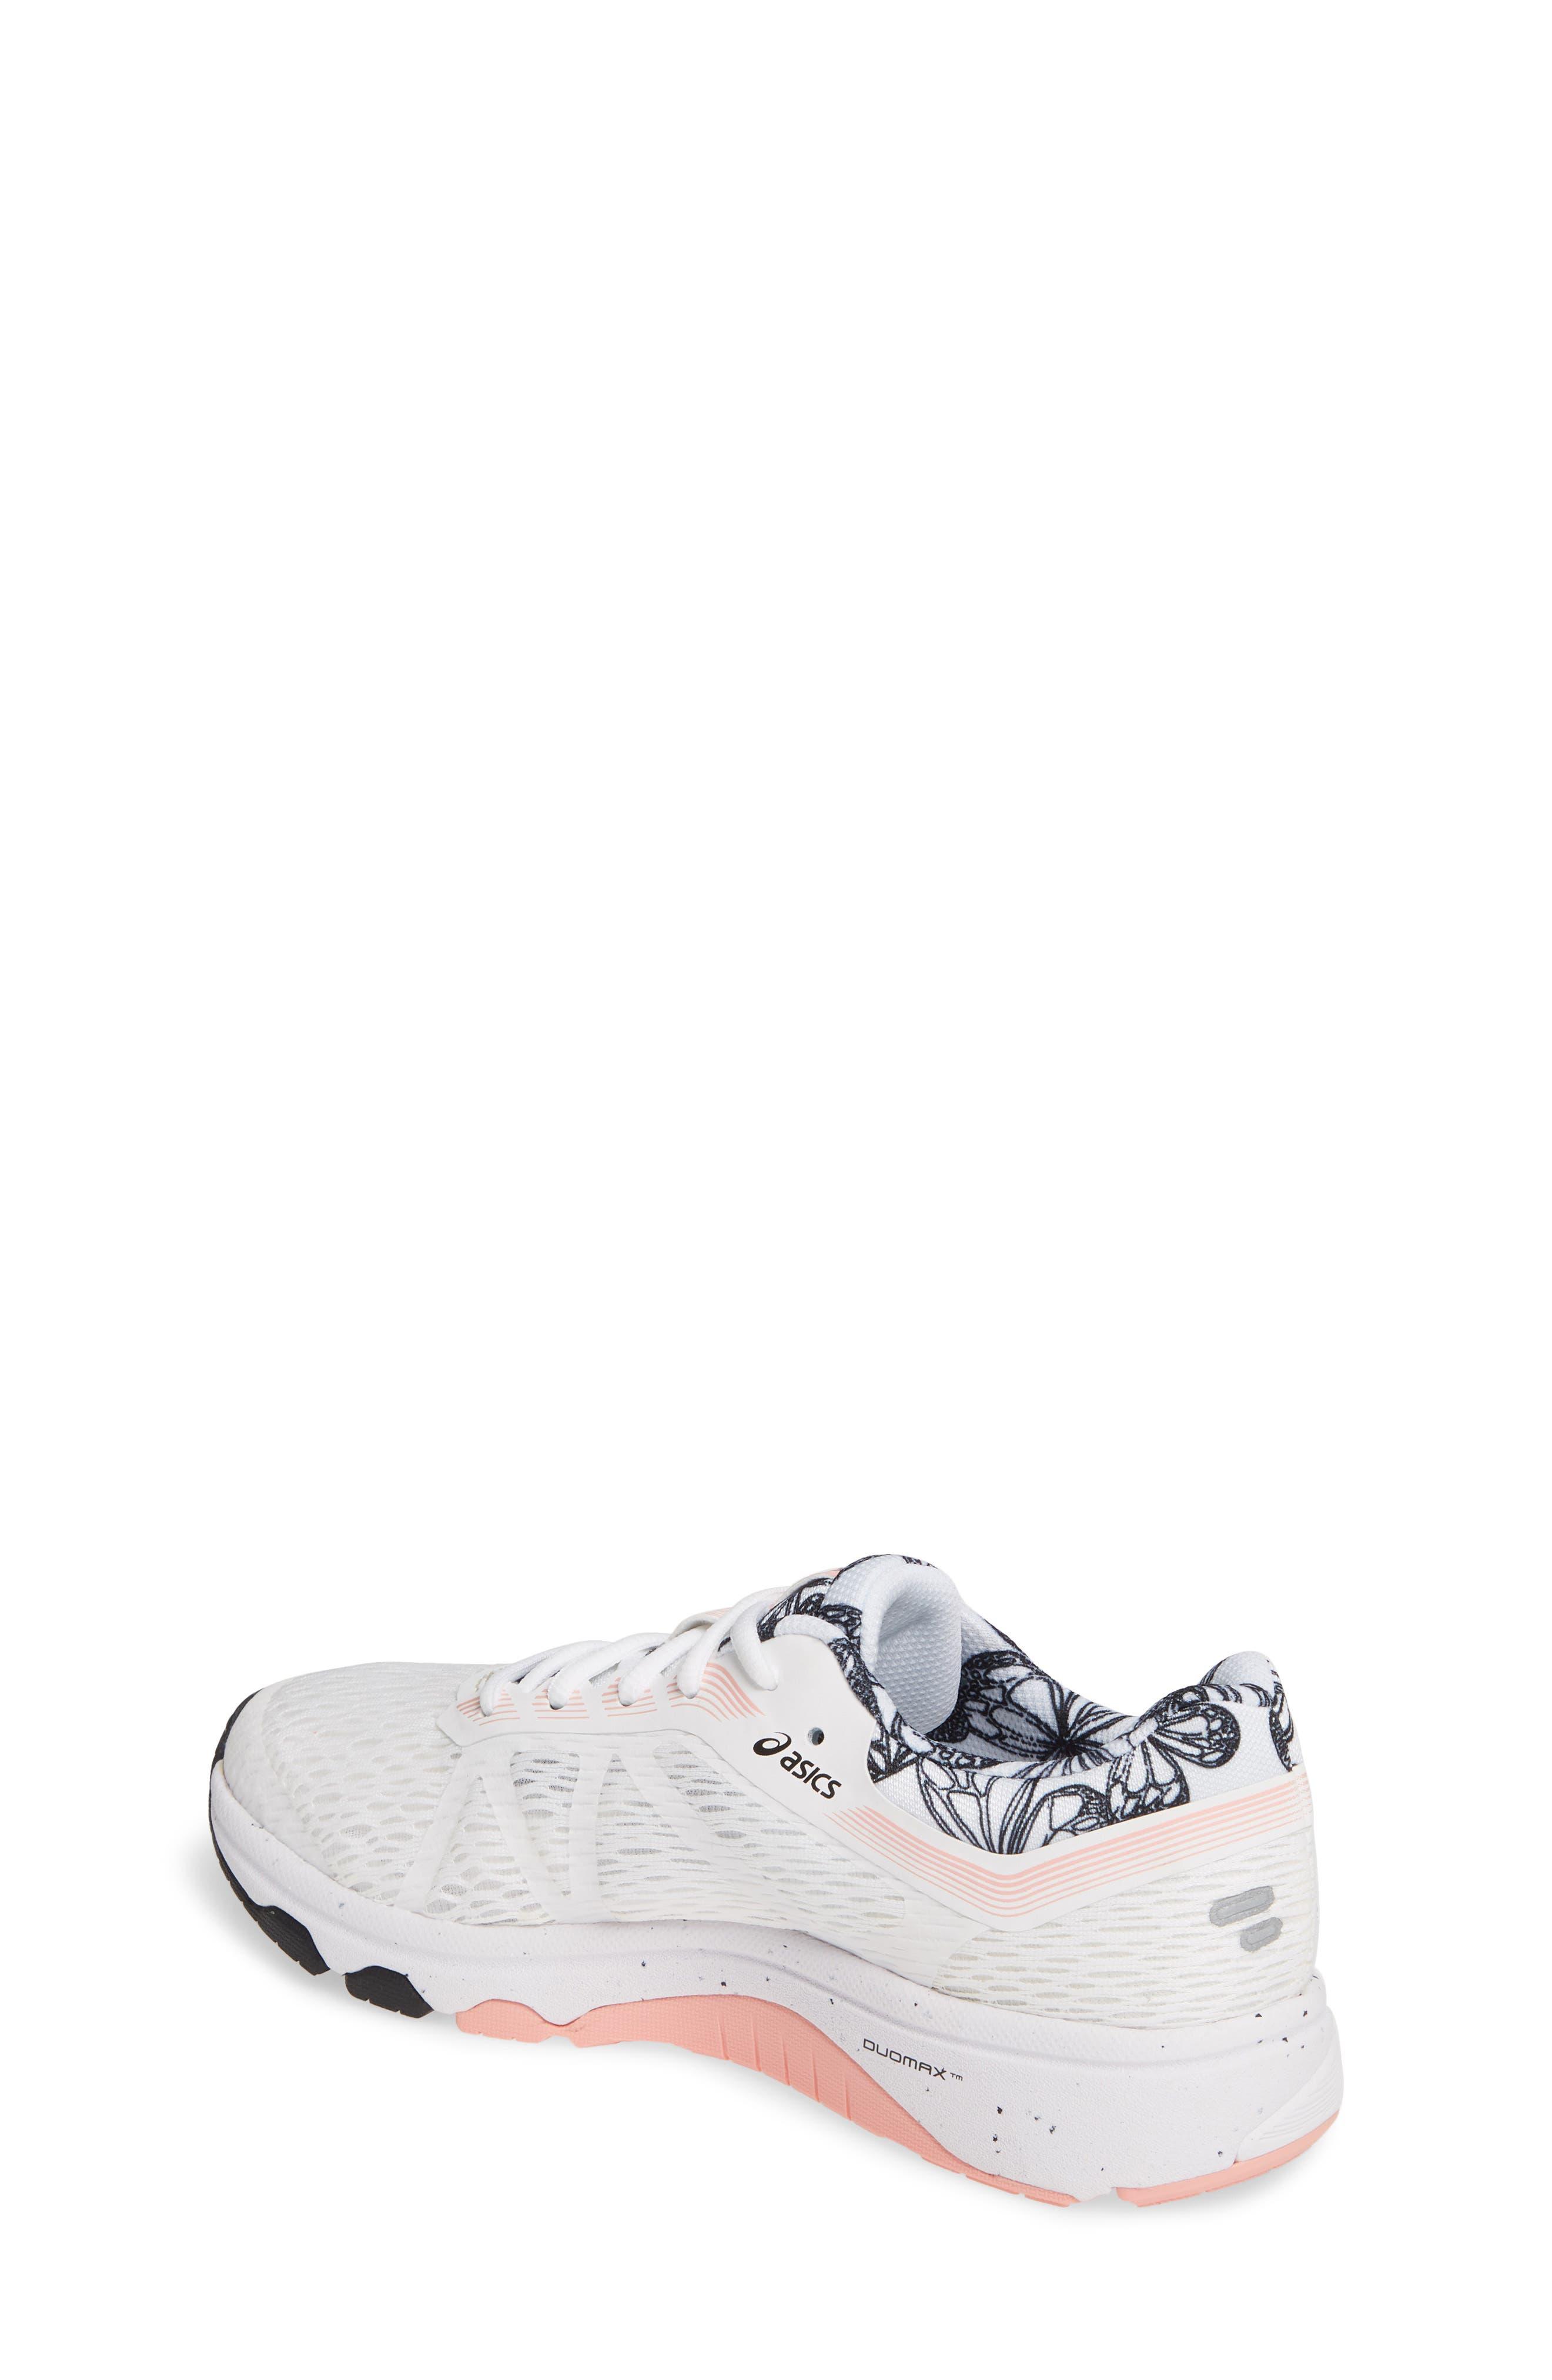 ASICS<SUP>®</SUP>, GT 1000 7 Running Shoe, Alternate thumbnail 2, color, WHITE/ WHITE